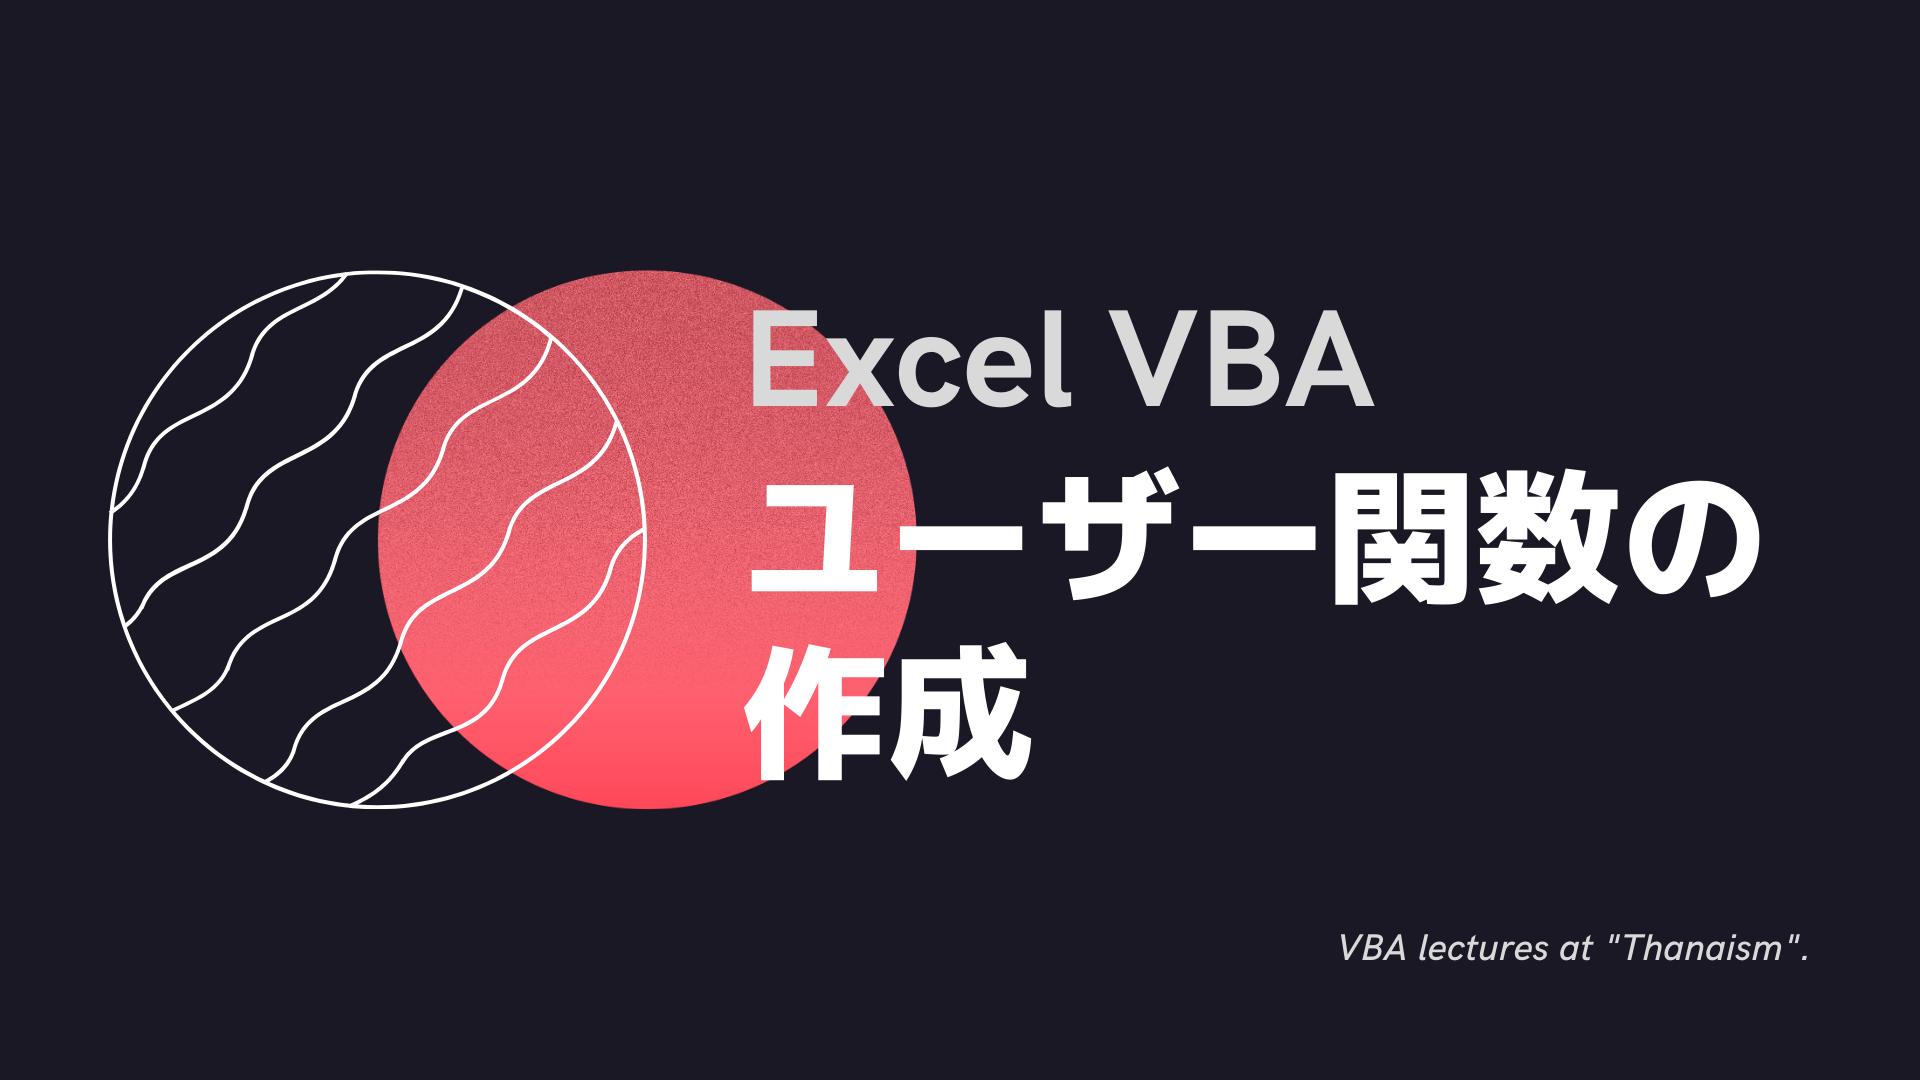 Excel VBA ユーザー関数の作成